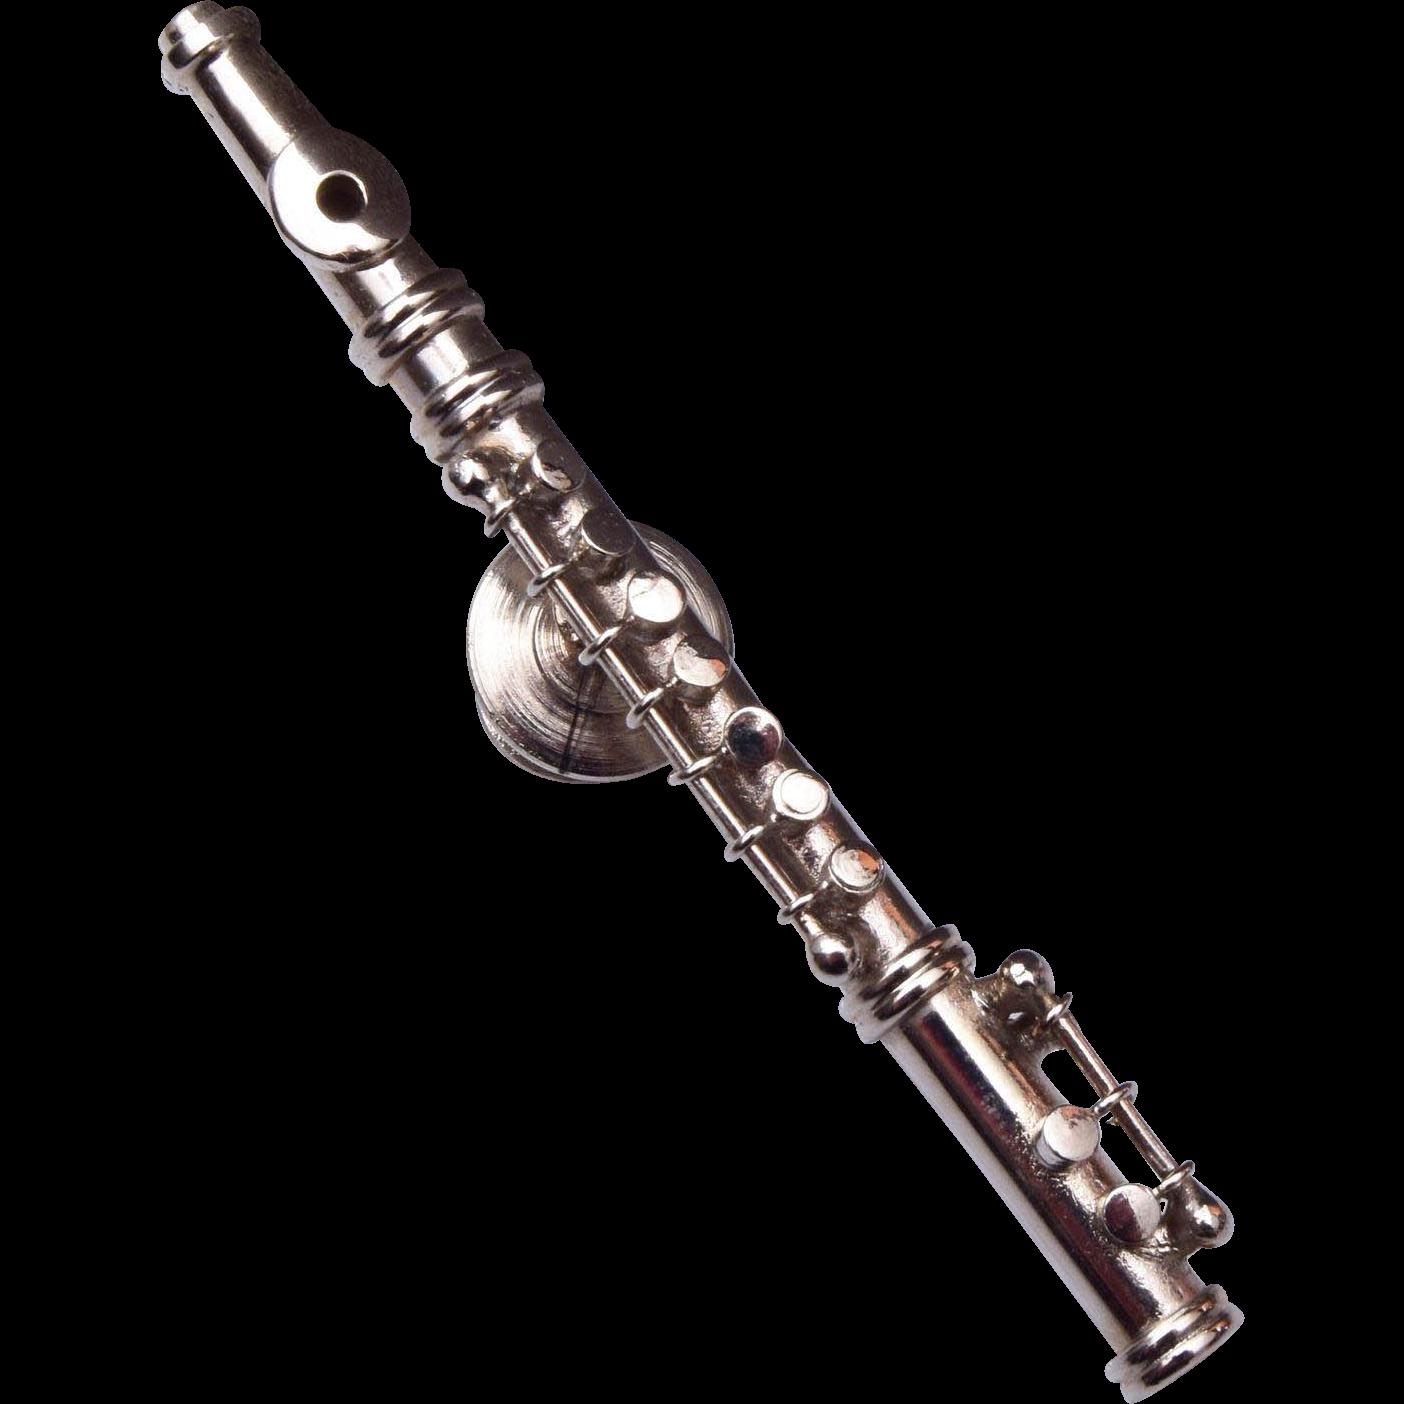 Flute Tie Pin or Brooch